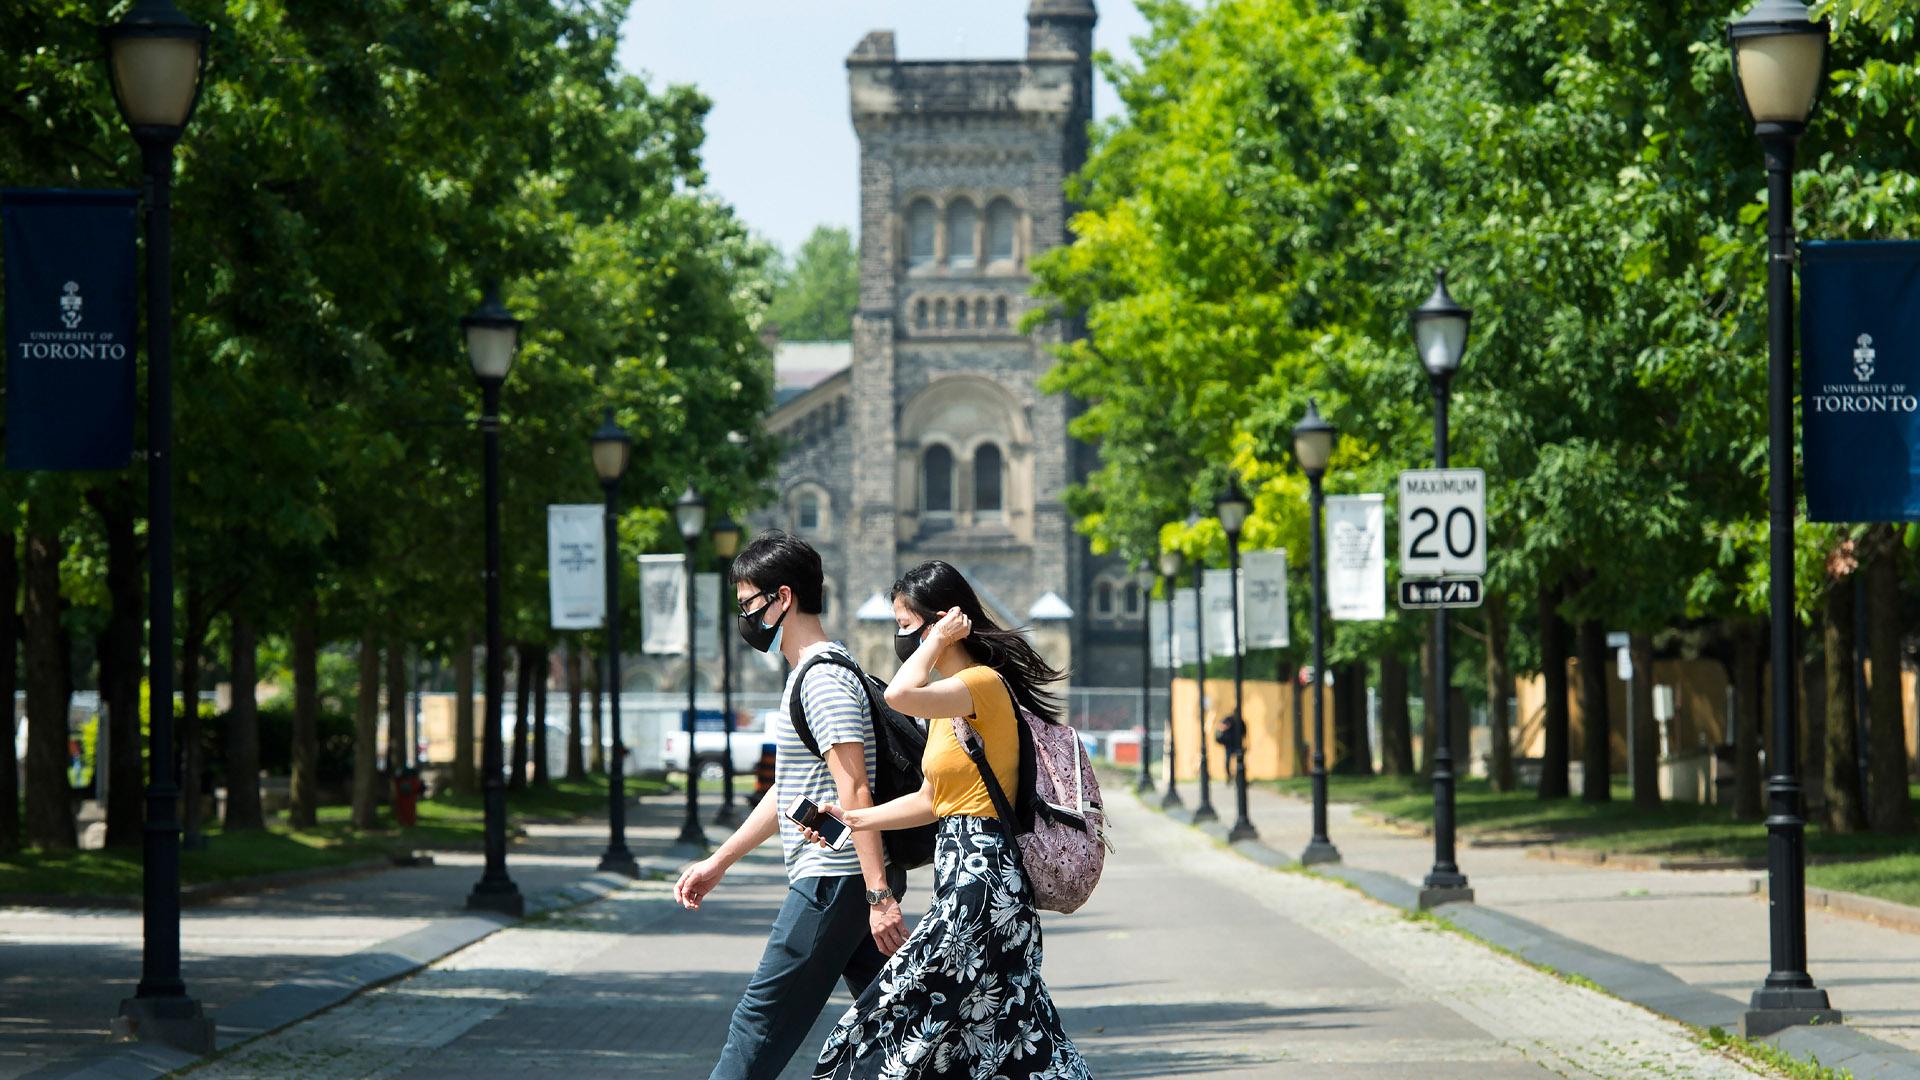 Growing number of Canadian universities make COVID-19 vaccine mandatory